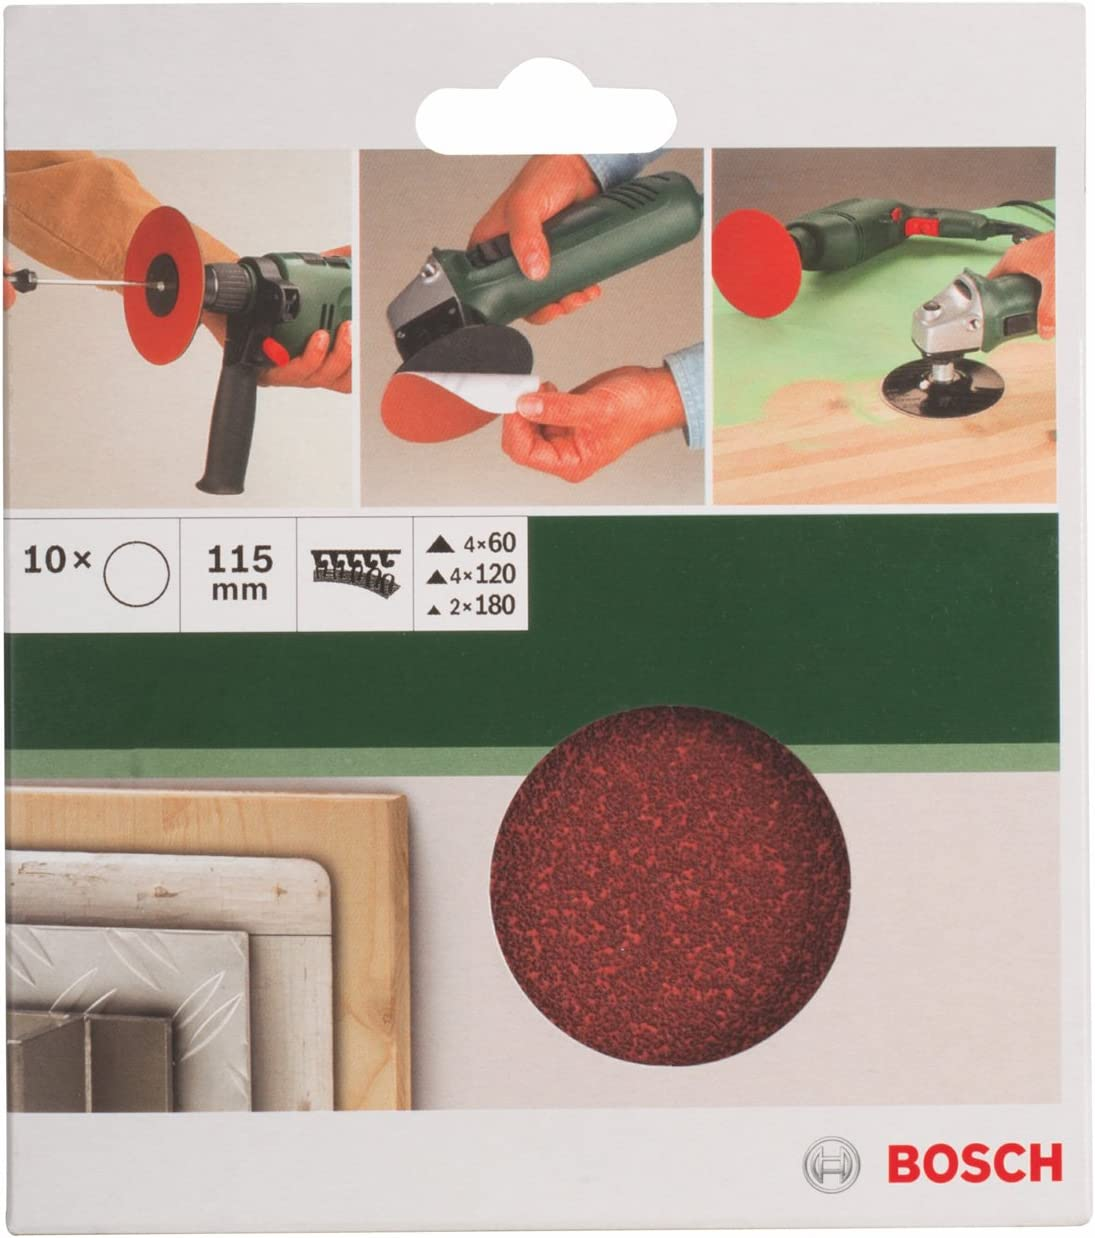 Bosch DIY 10tlg Papierschleifblatt-Set f/ür Winkelschleifer verschiedene Materialien /Ø 115 mm, K/örnung 60//120//180